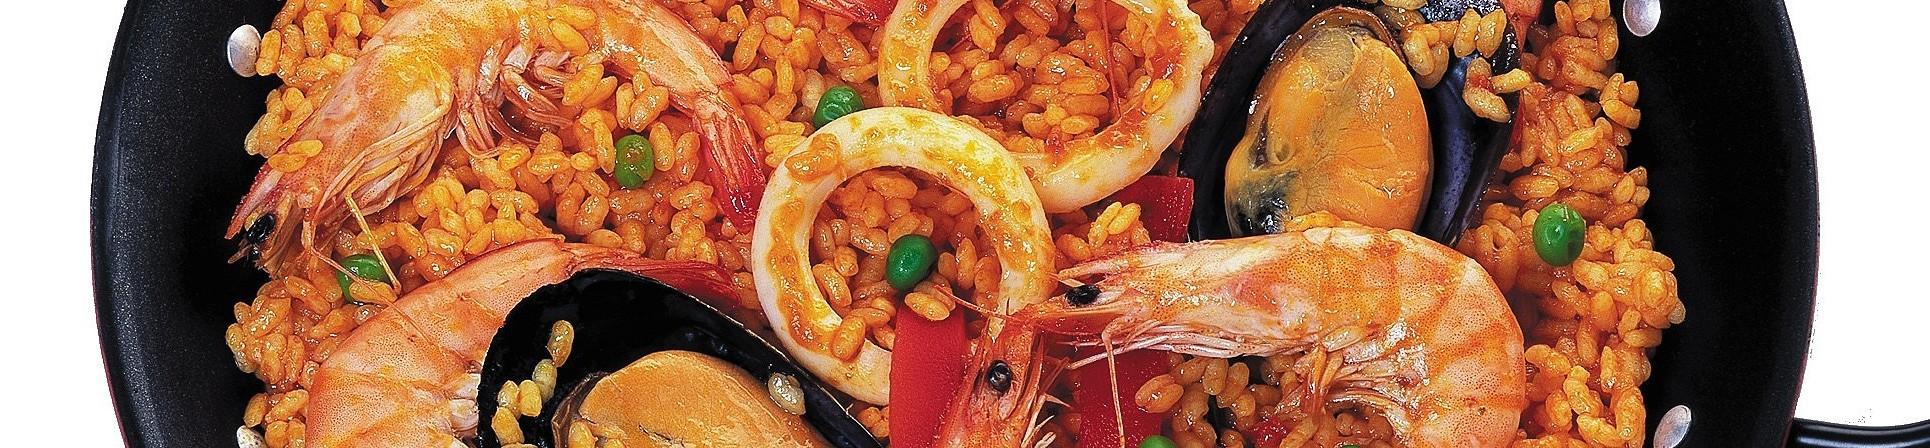 Paella de marisco surgelata - vendita online